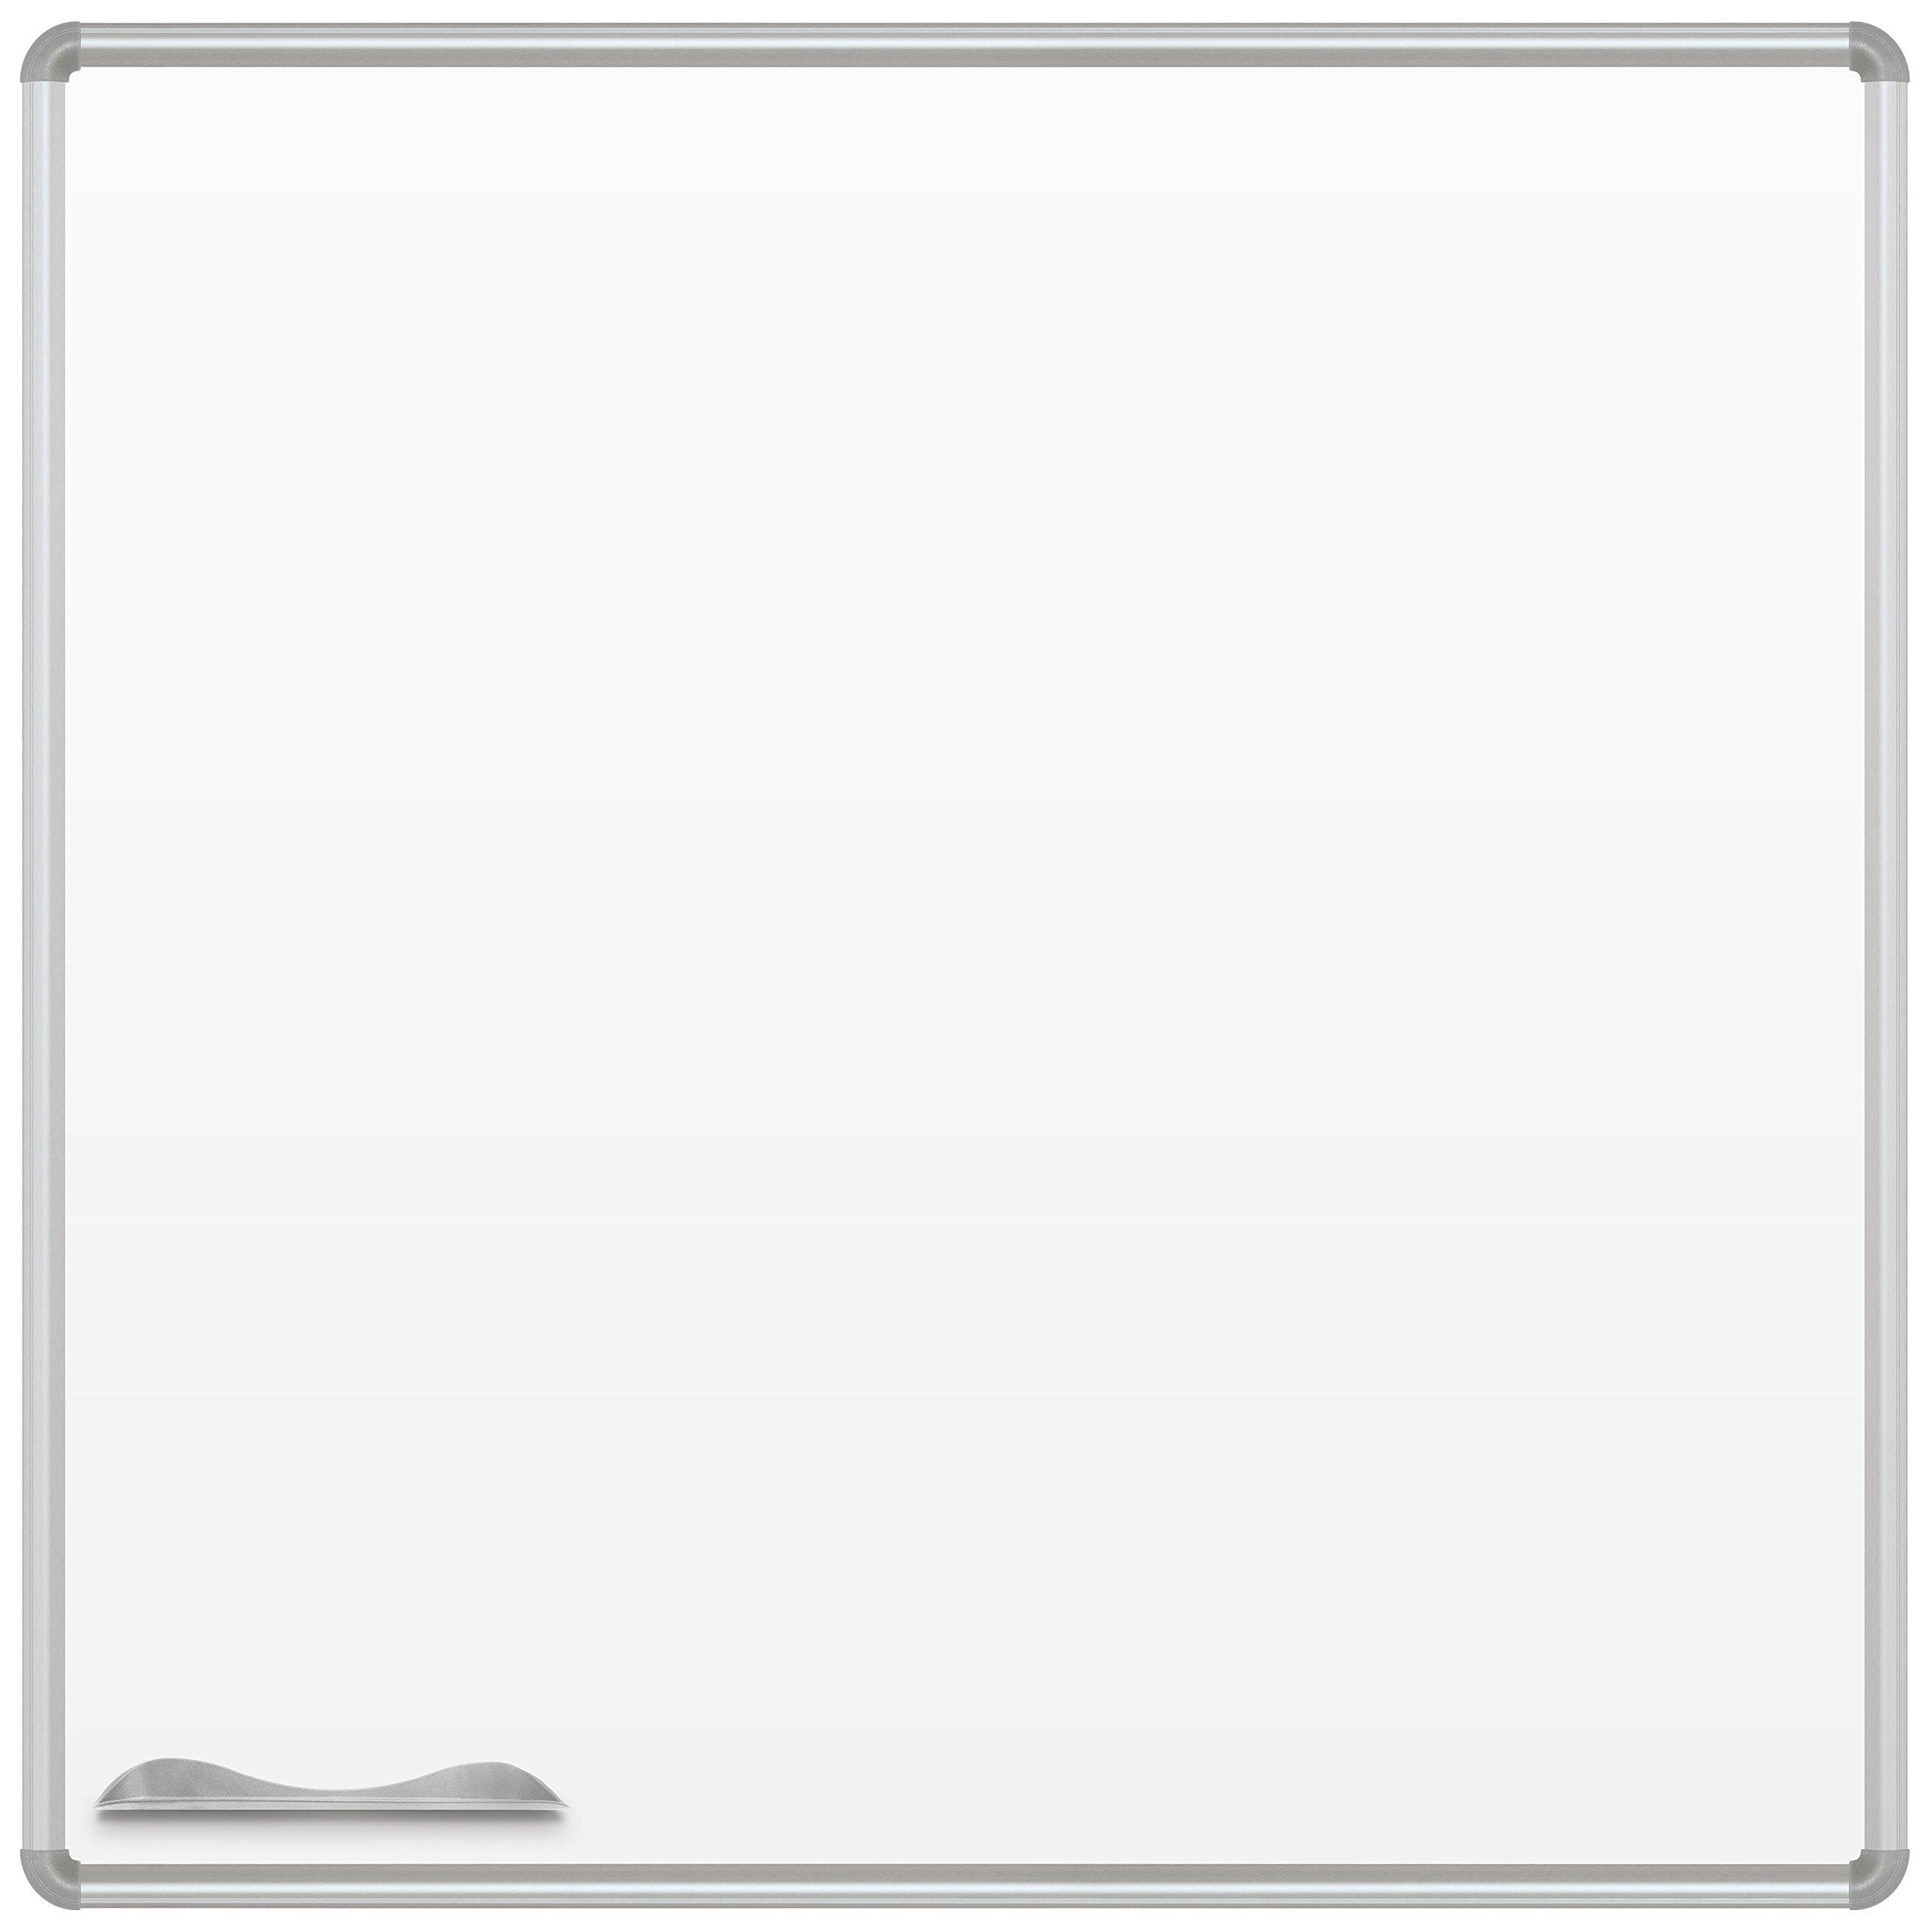 Best-Rite Presidential Frame Magne-Rite Dry Erase Whiteboard, 4 x 4 Feet (219PD)